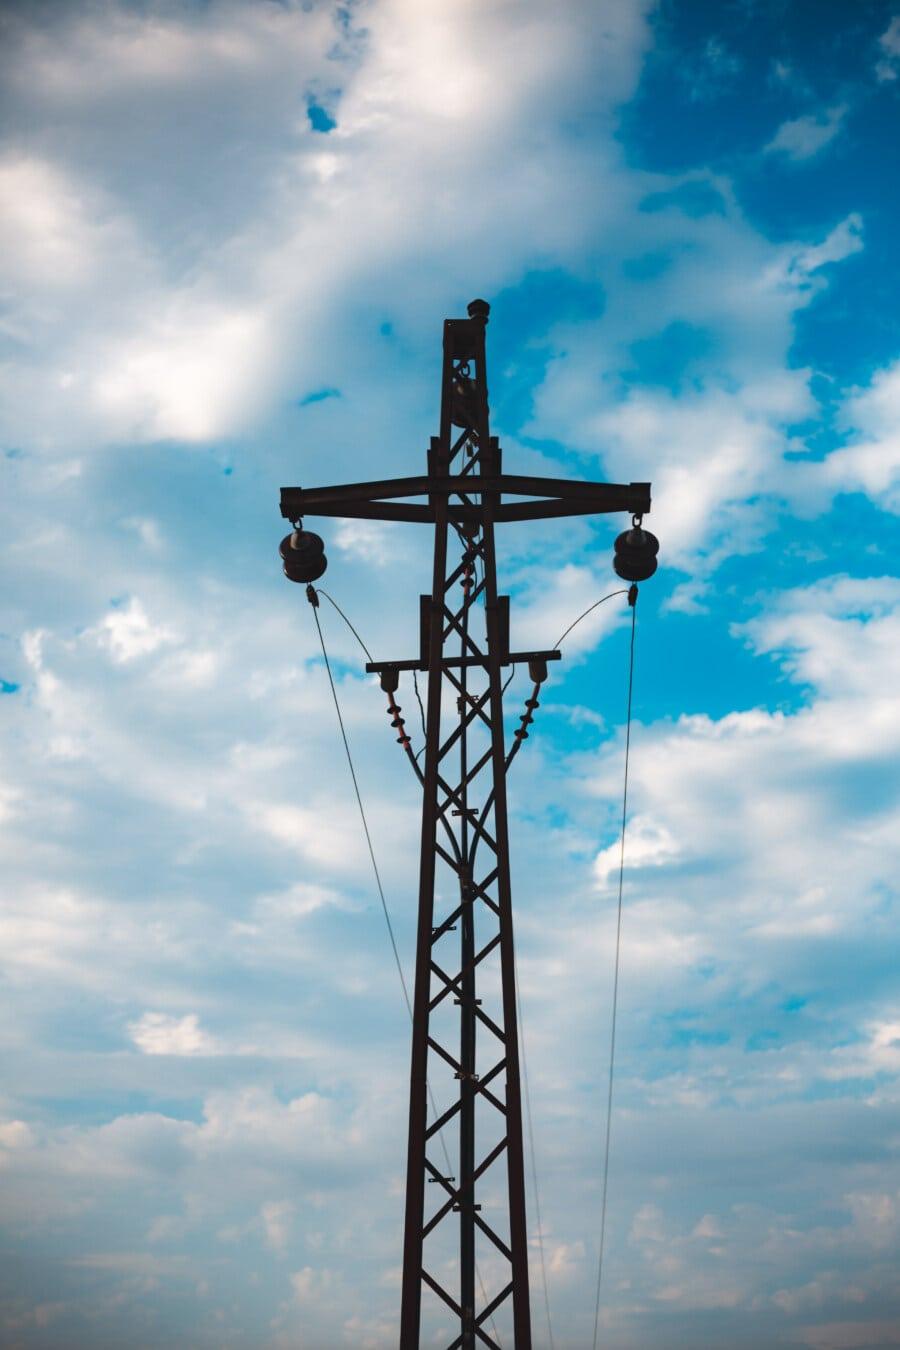 Verteilung, Strom, Pol, Elektro, Turm, Antenne, Kabel, Draht, Energie, Spannung